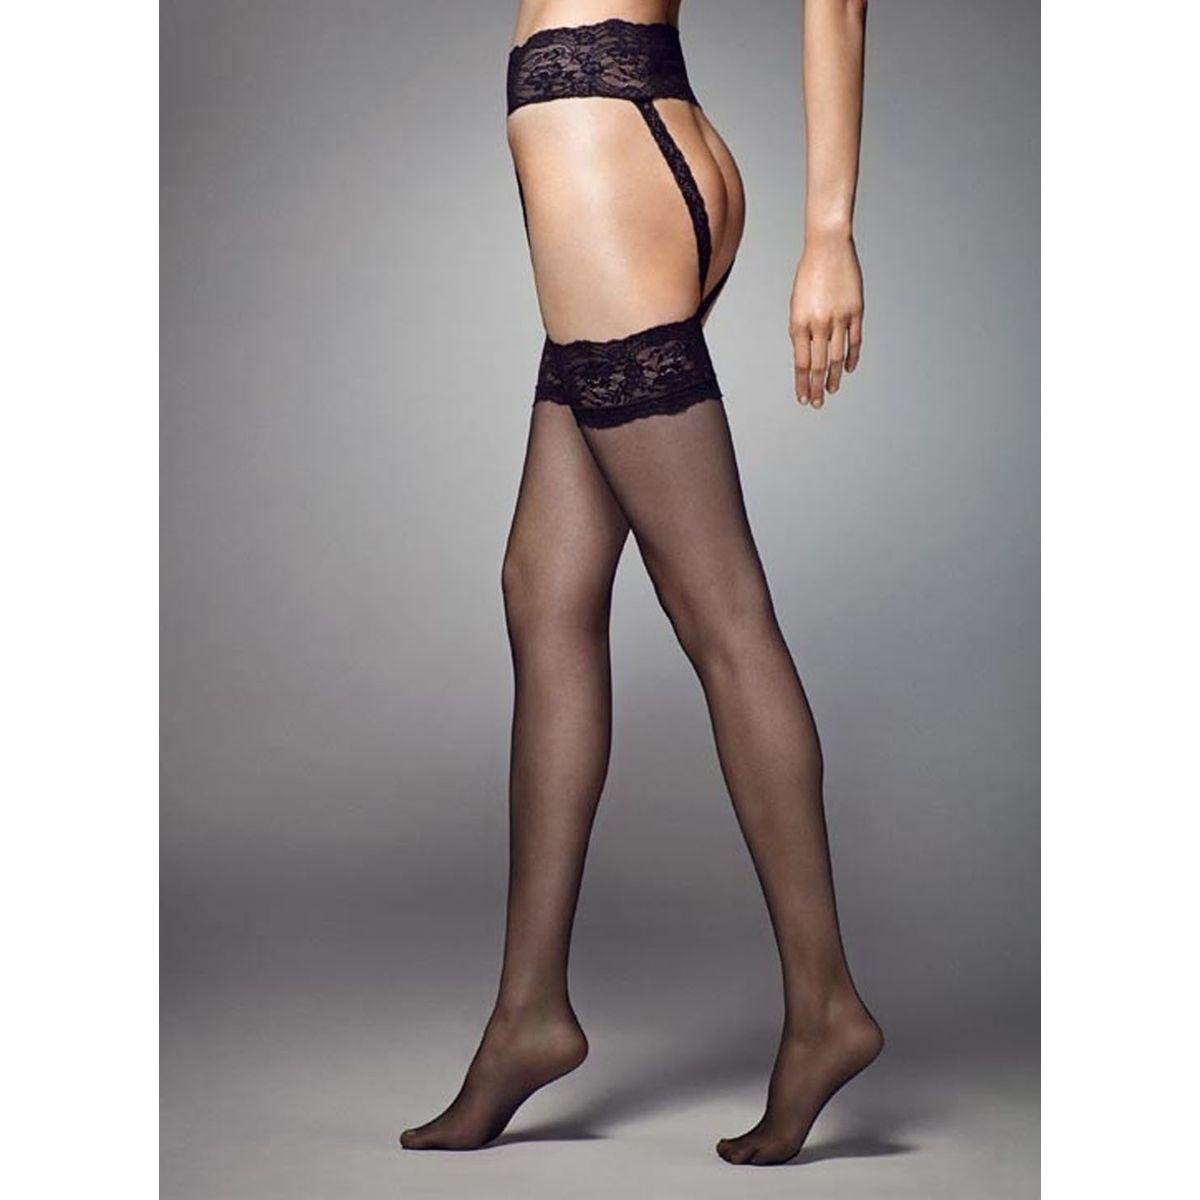 Collant Strippante 15D